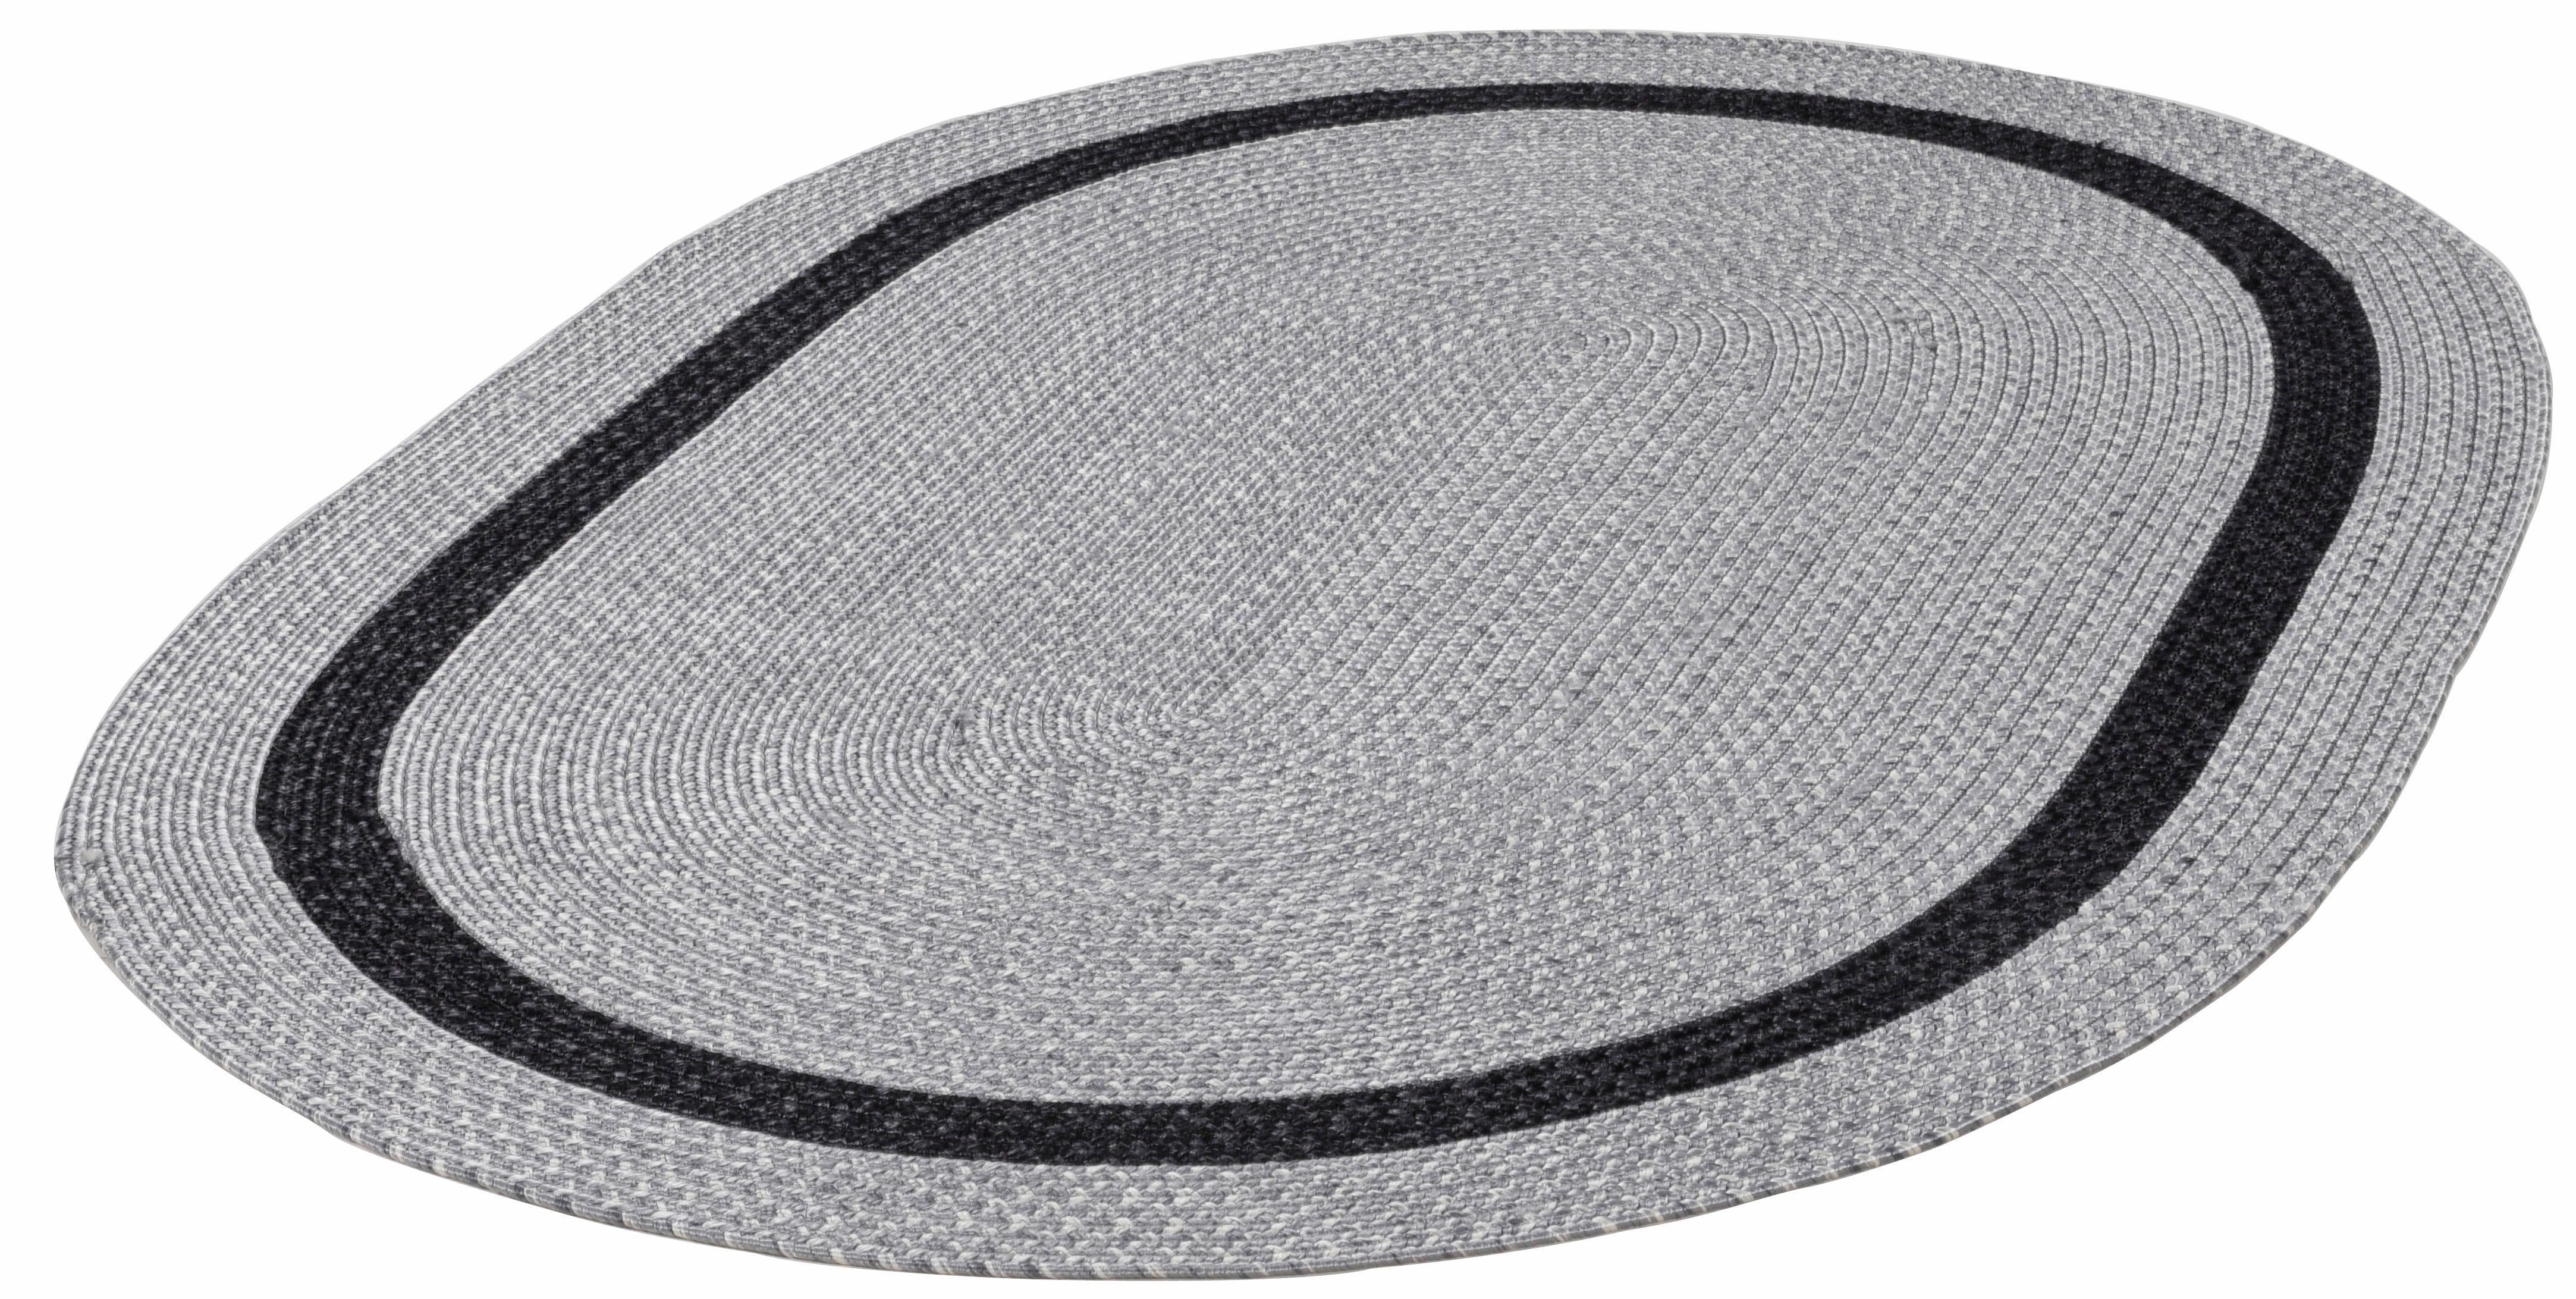 Teppich Benito THEKO oval Höhe 6 mm handgewebt